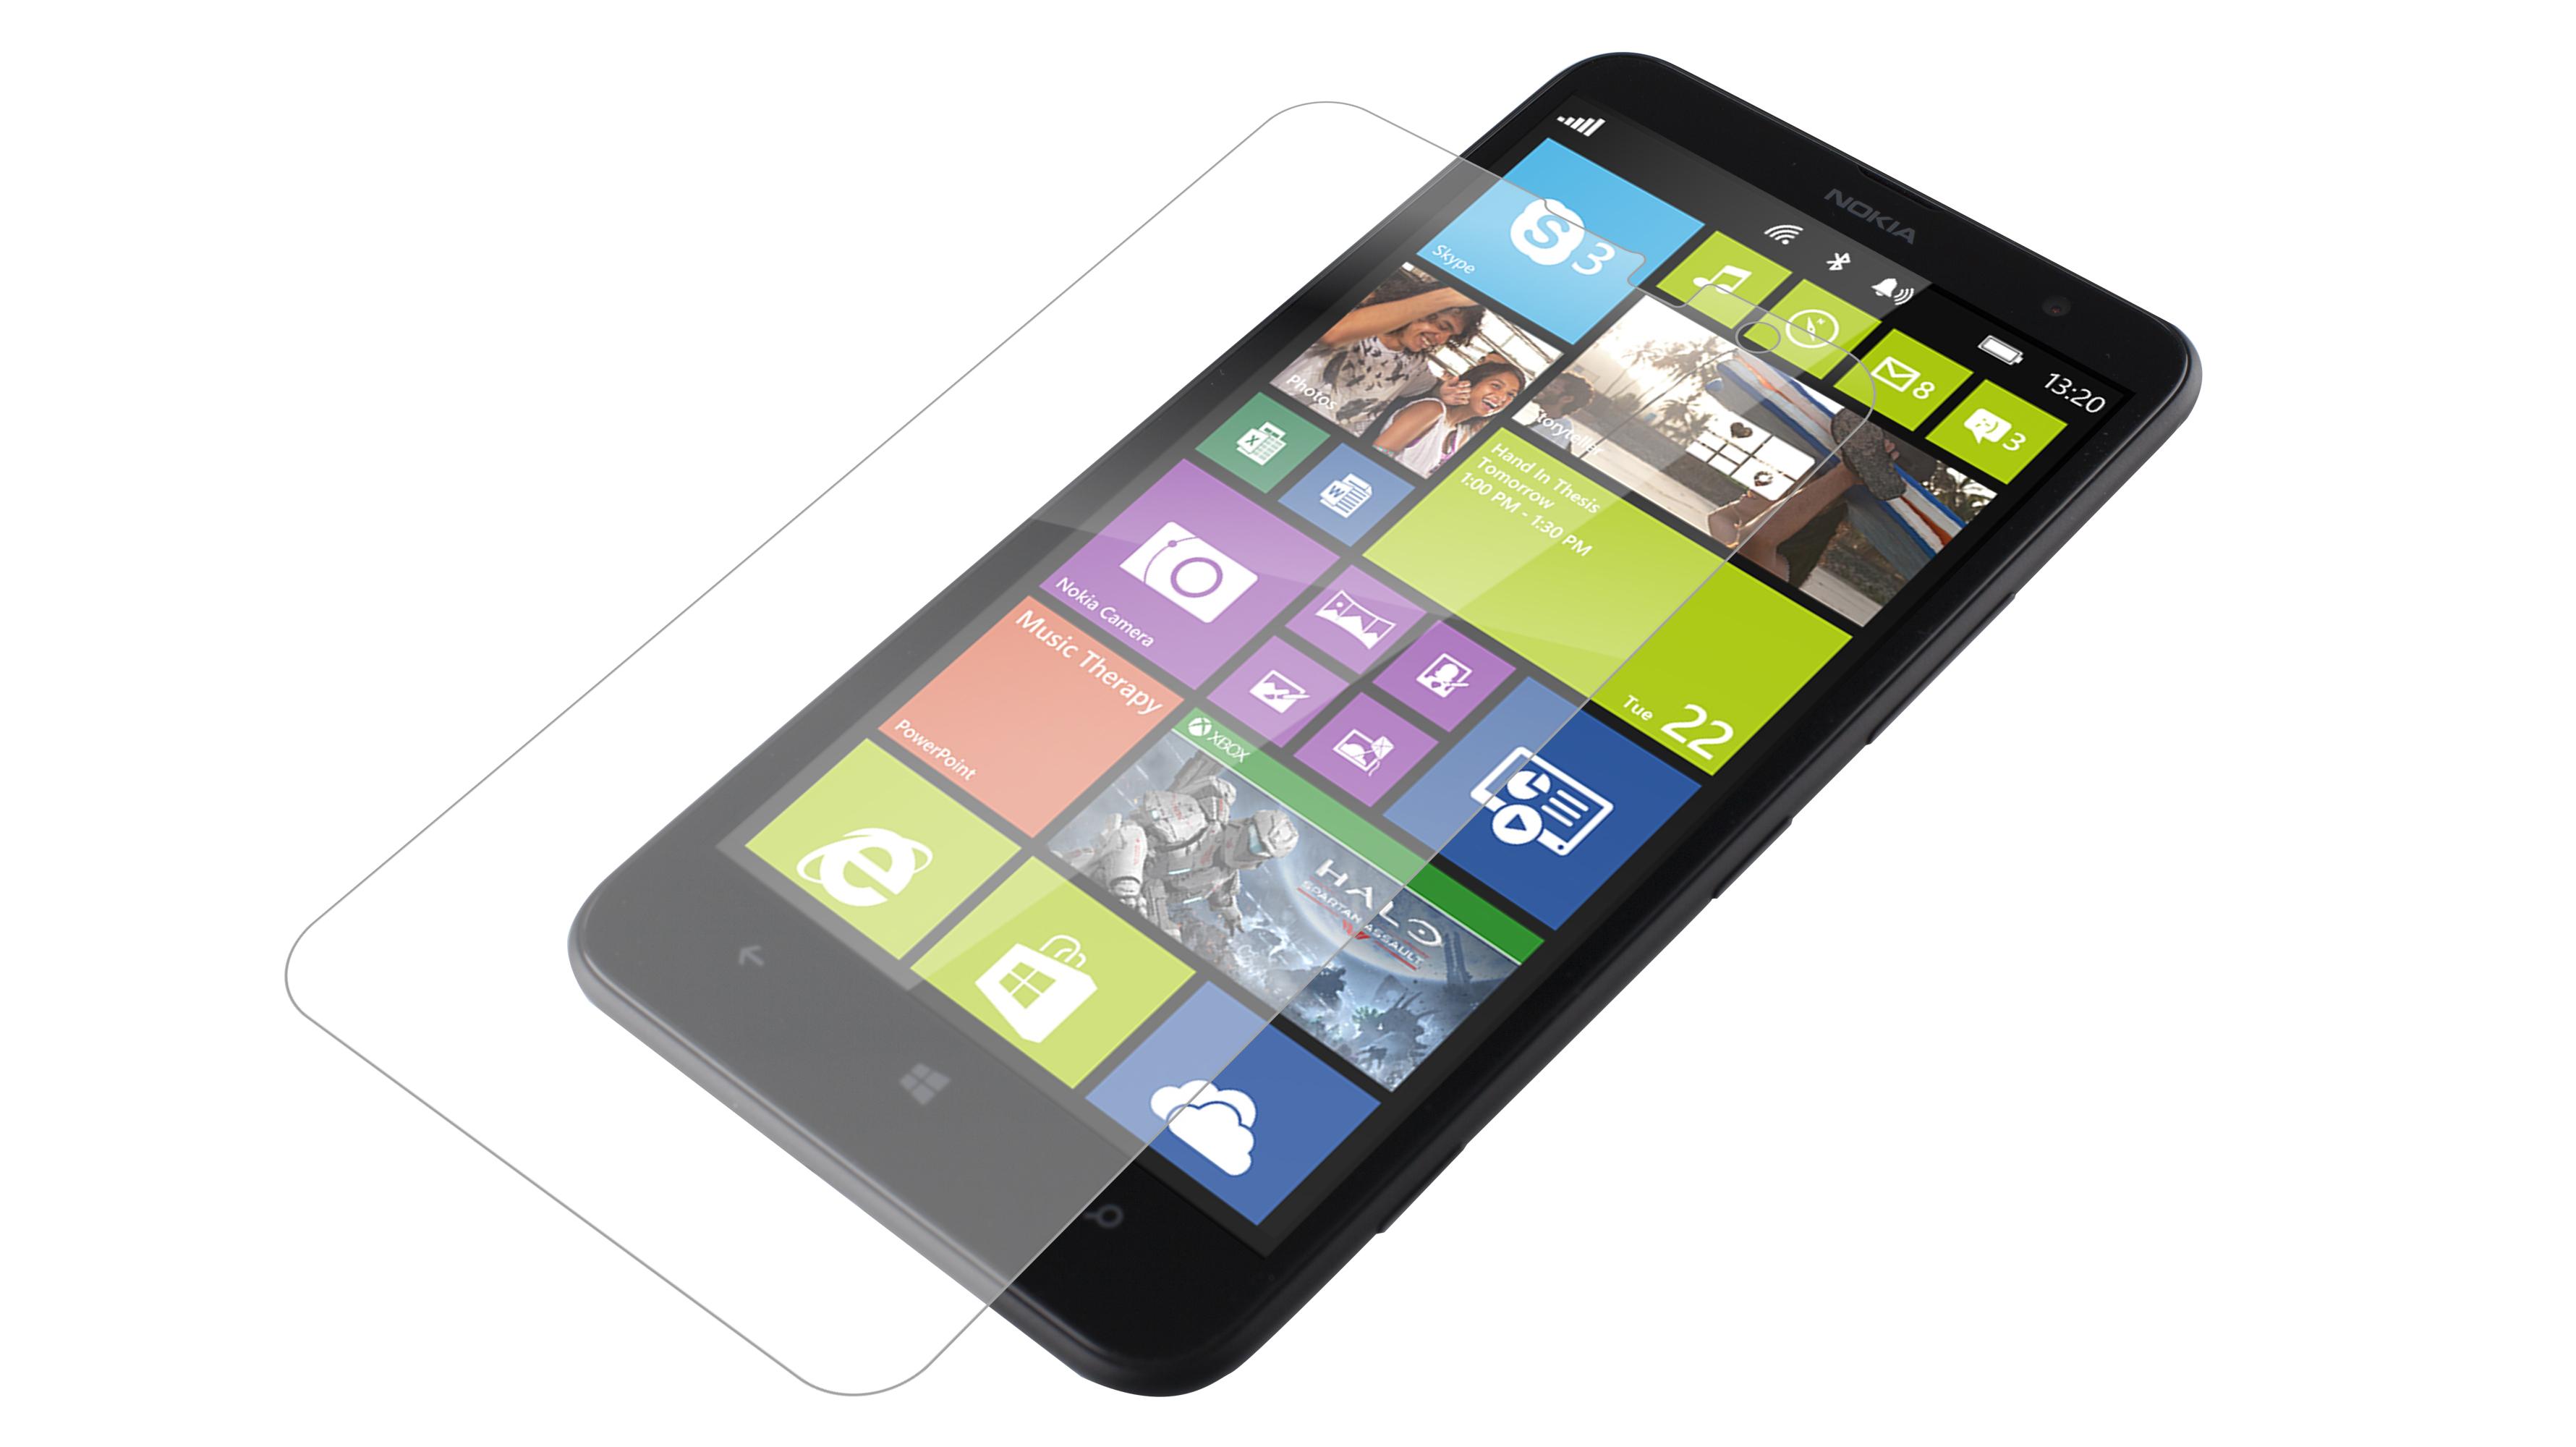 InvisibleShield Original for the Nokia Lumia 1320